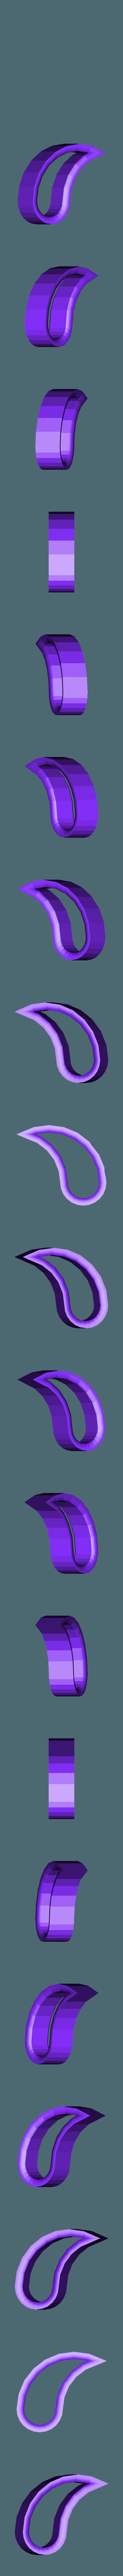 block fenetre partie interieur pla.stl Download STL file Door & Window Block • 3D printer model, YOHAN_3D